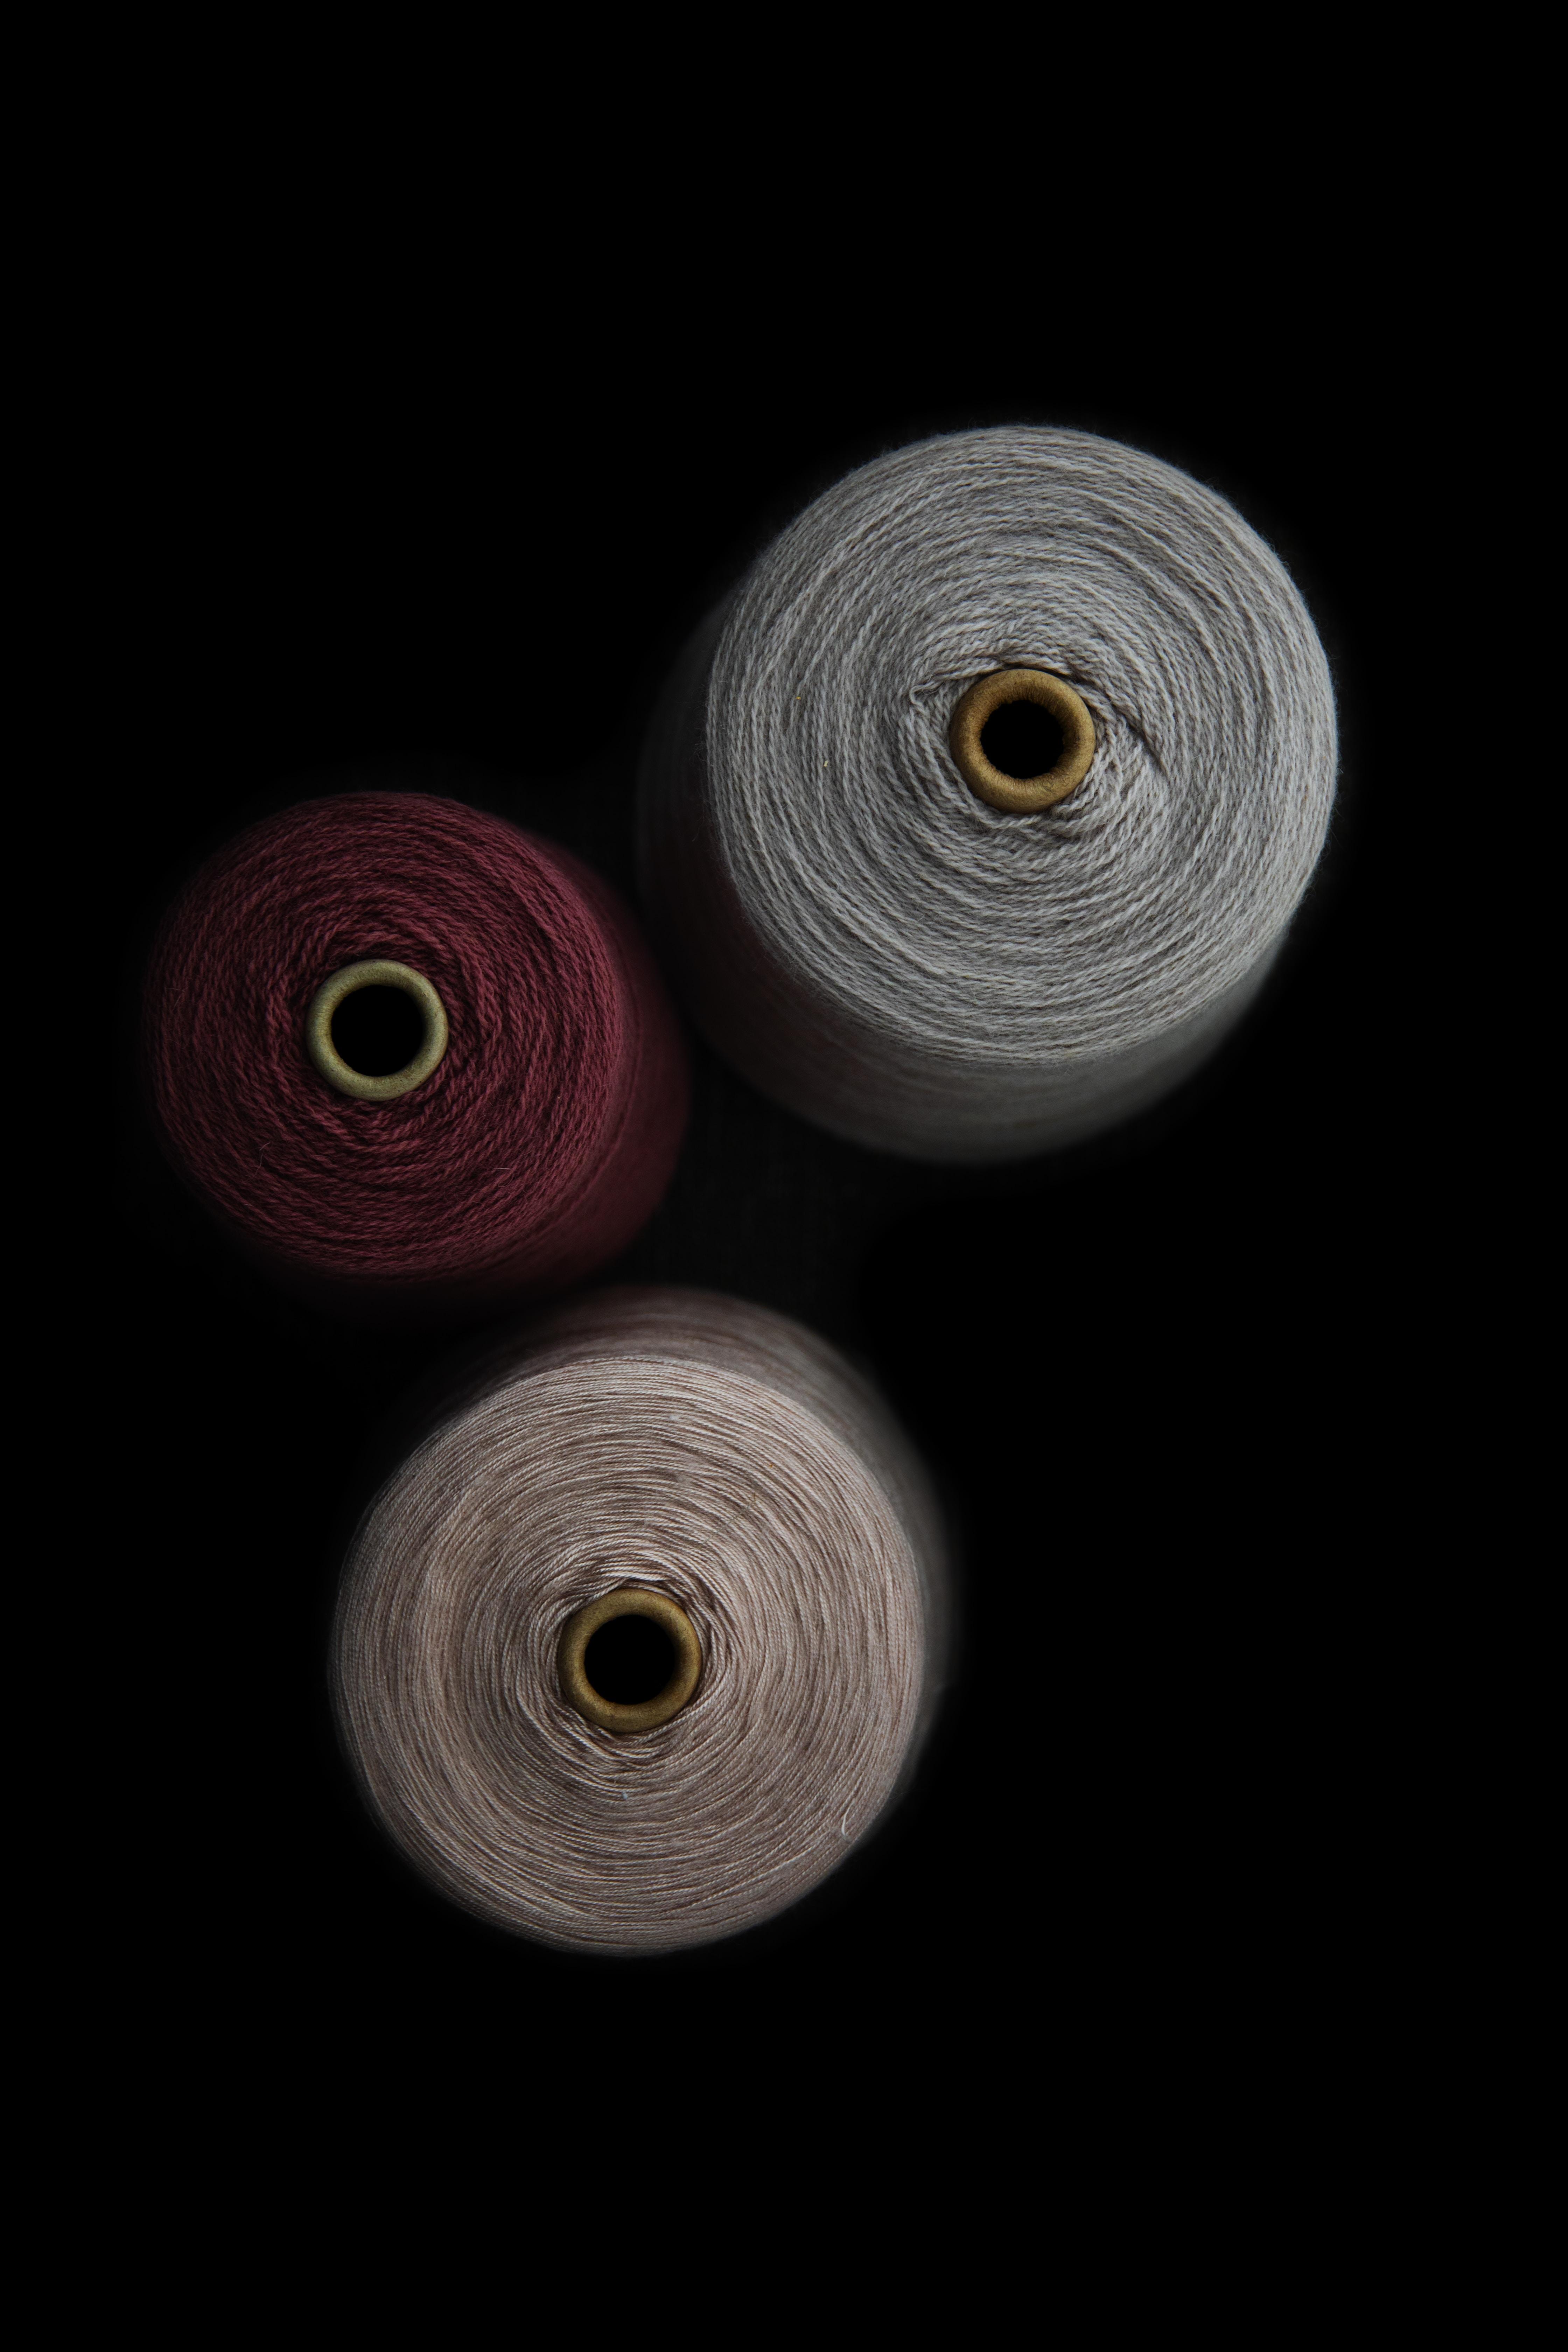 three assorted-color thread rolls